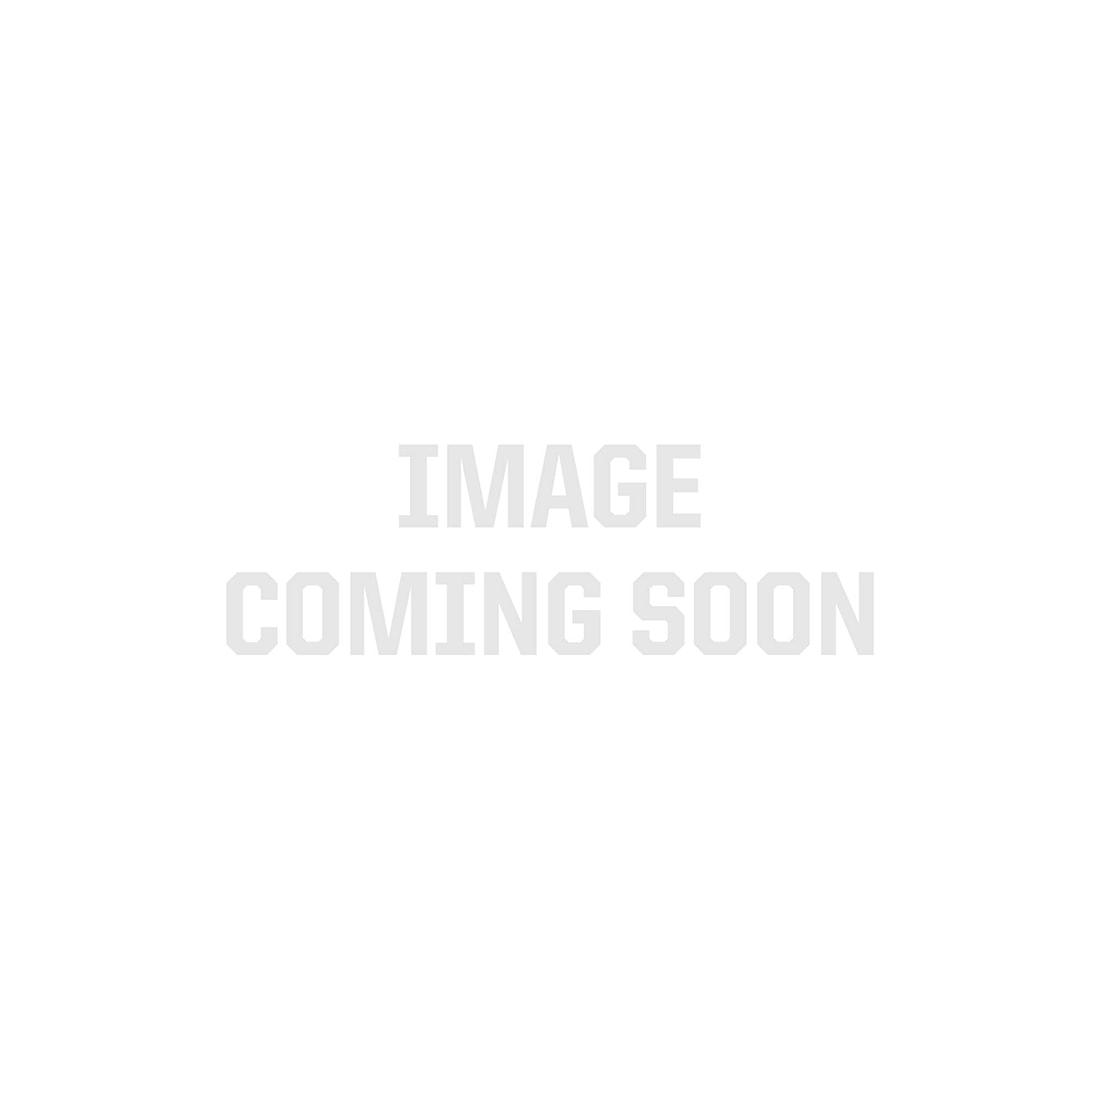 Soft White 3014 Side View LED Strip Light, 96/m, 8mm wide, Sample Kit